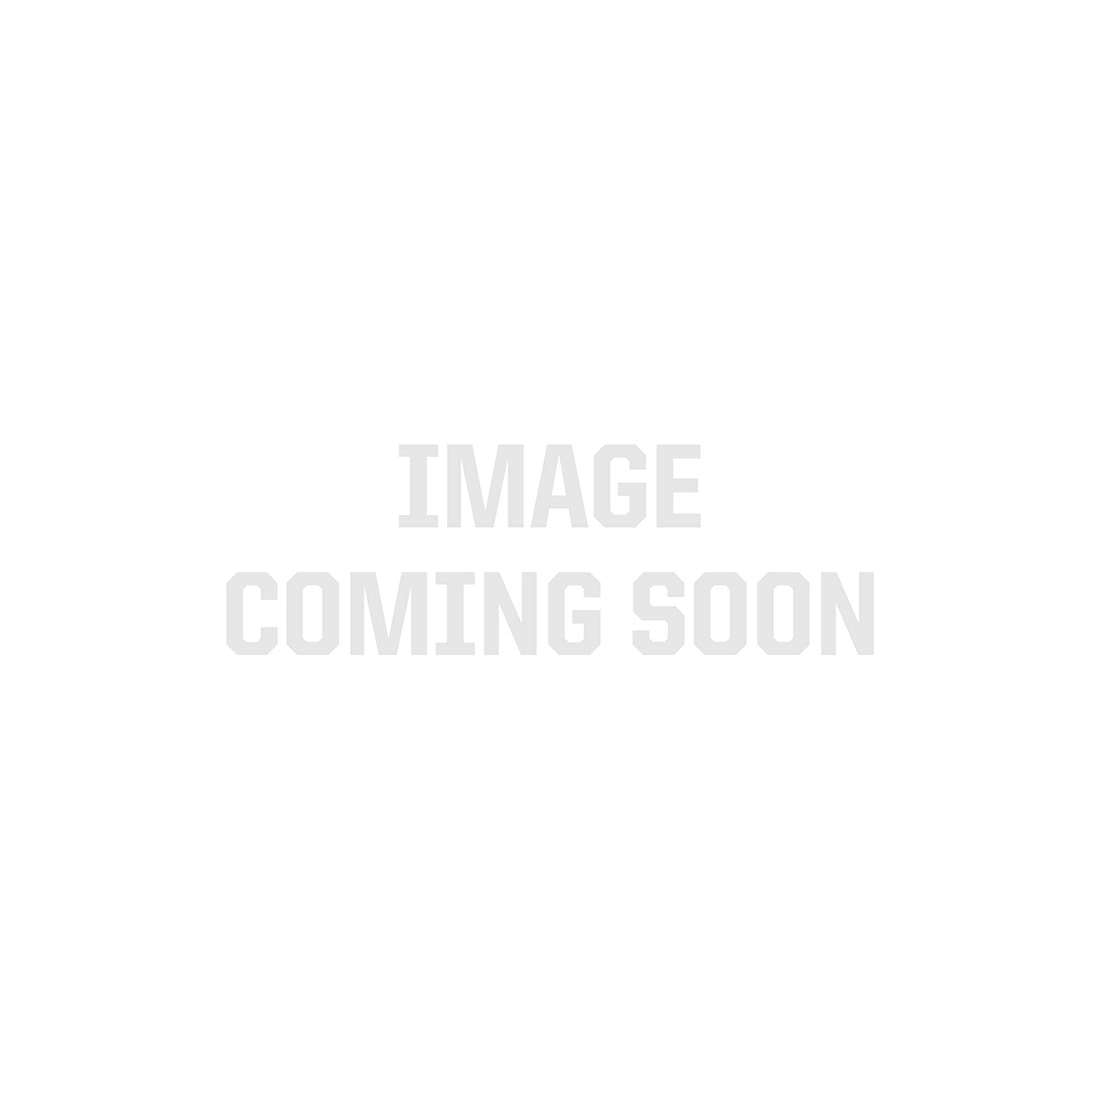 MaxRun Waterproof Warm White 2835 Single Row CurrentControl LED Strip Light, 60/m, 10mm wide, Sample Kit